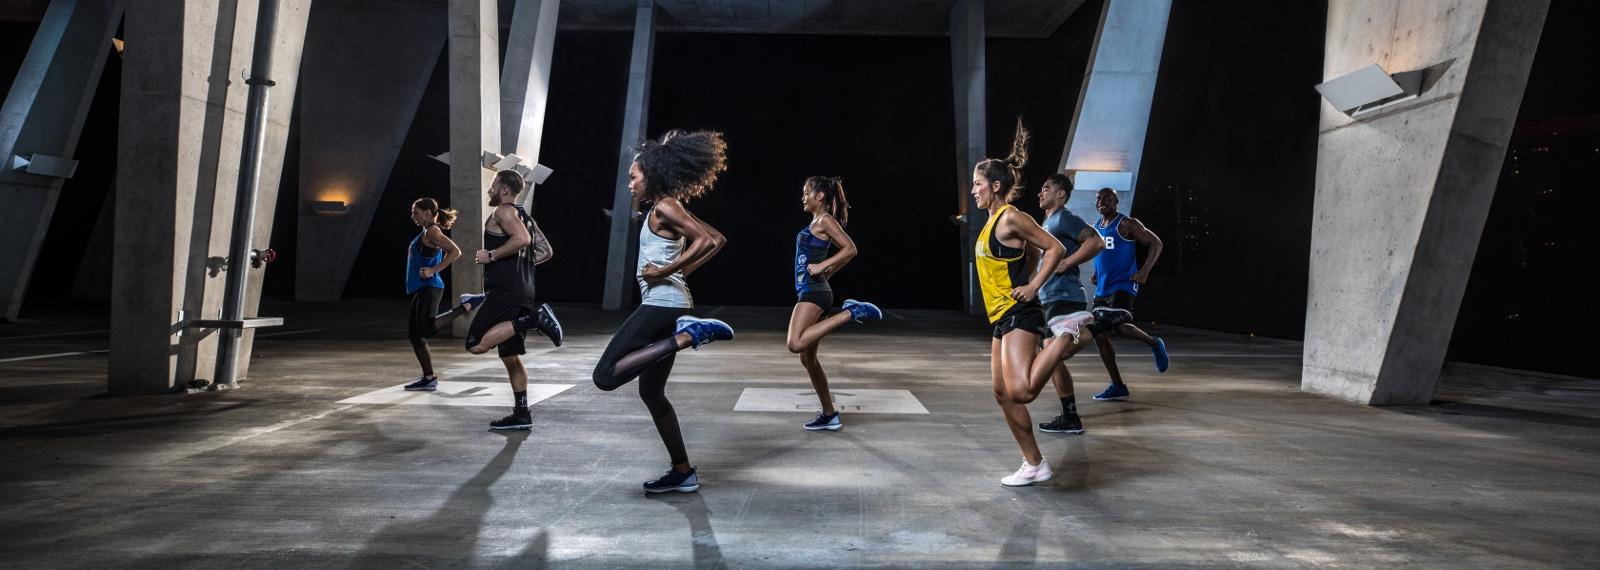 BodyAttack Kurs im Fitness-Loft